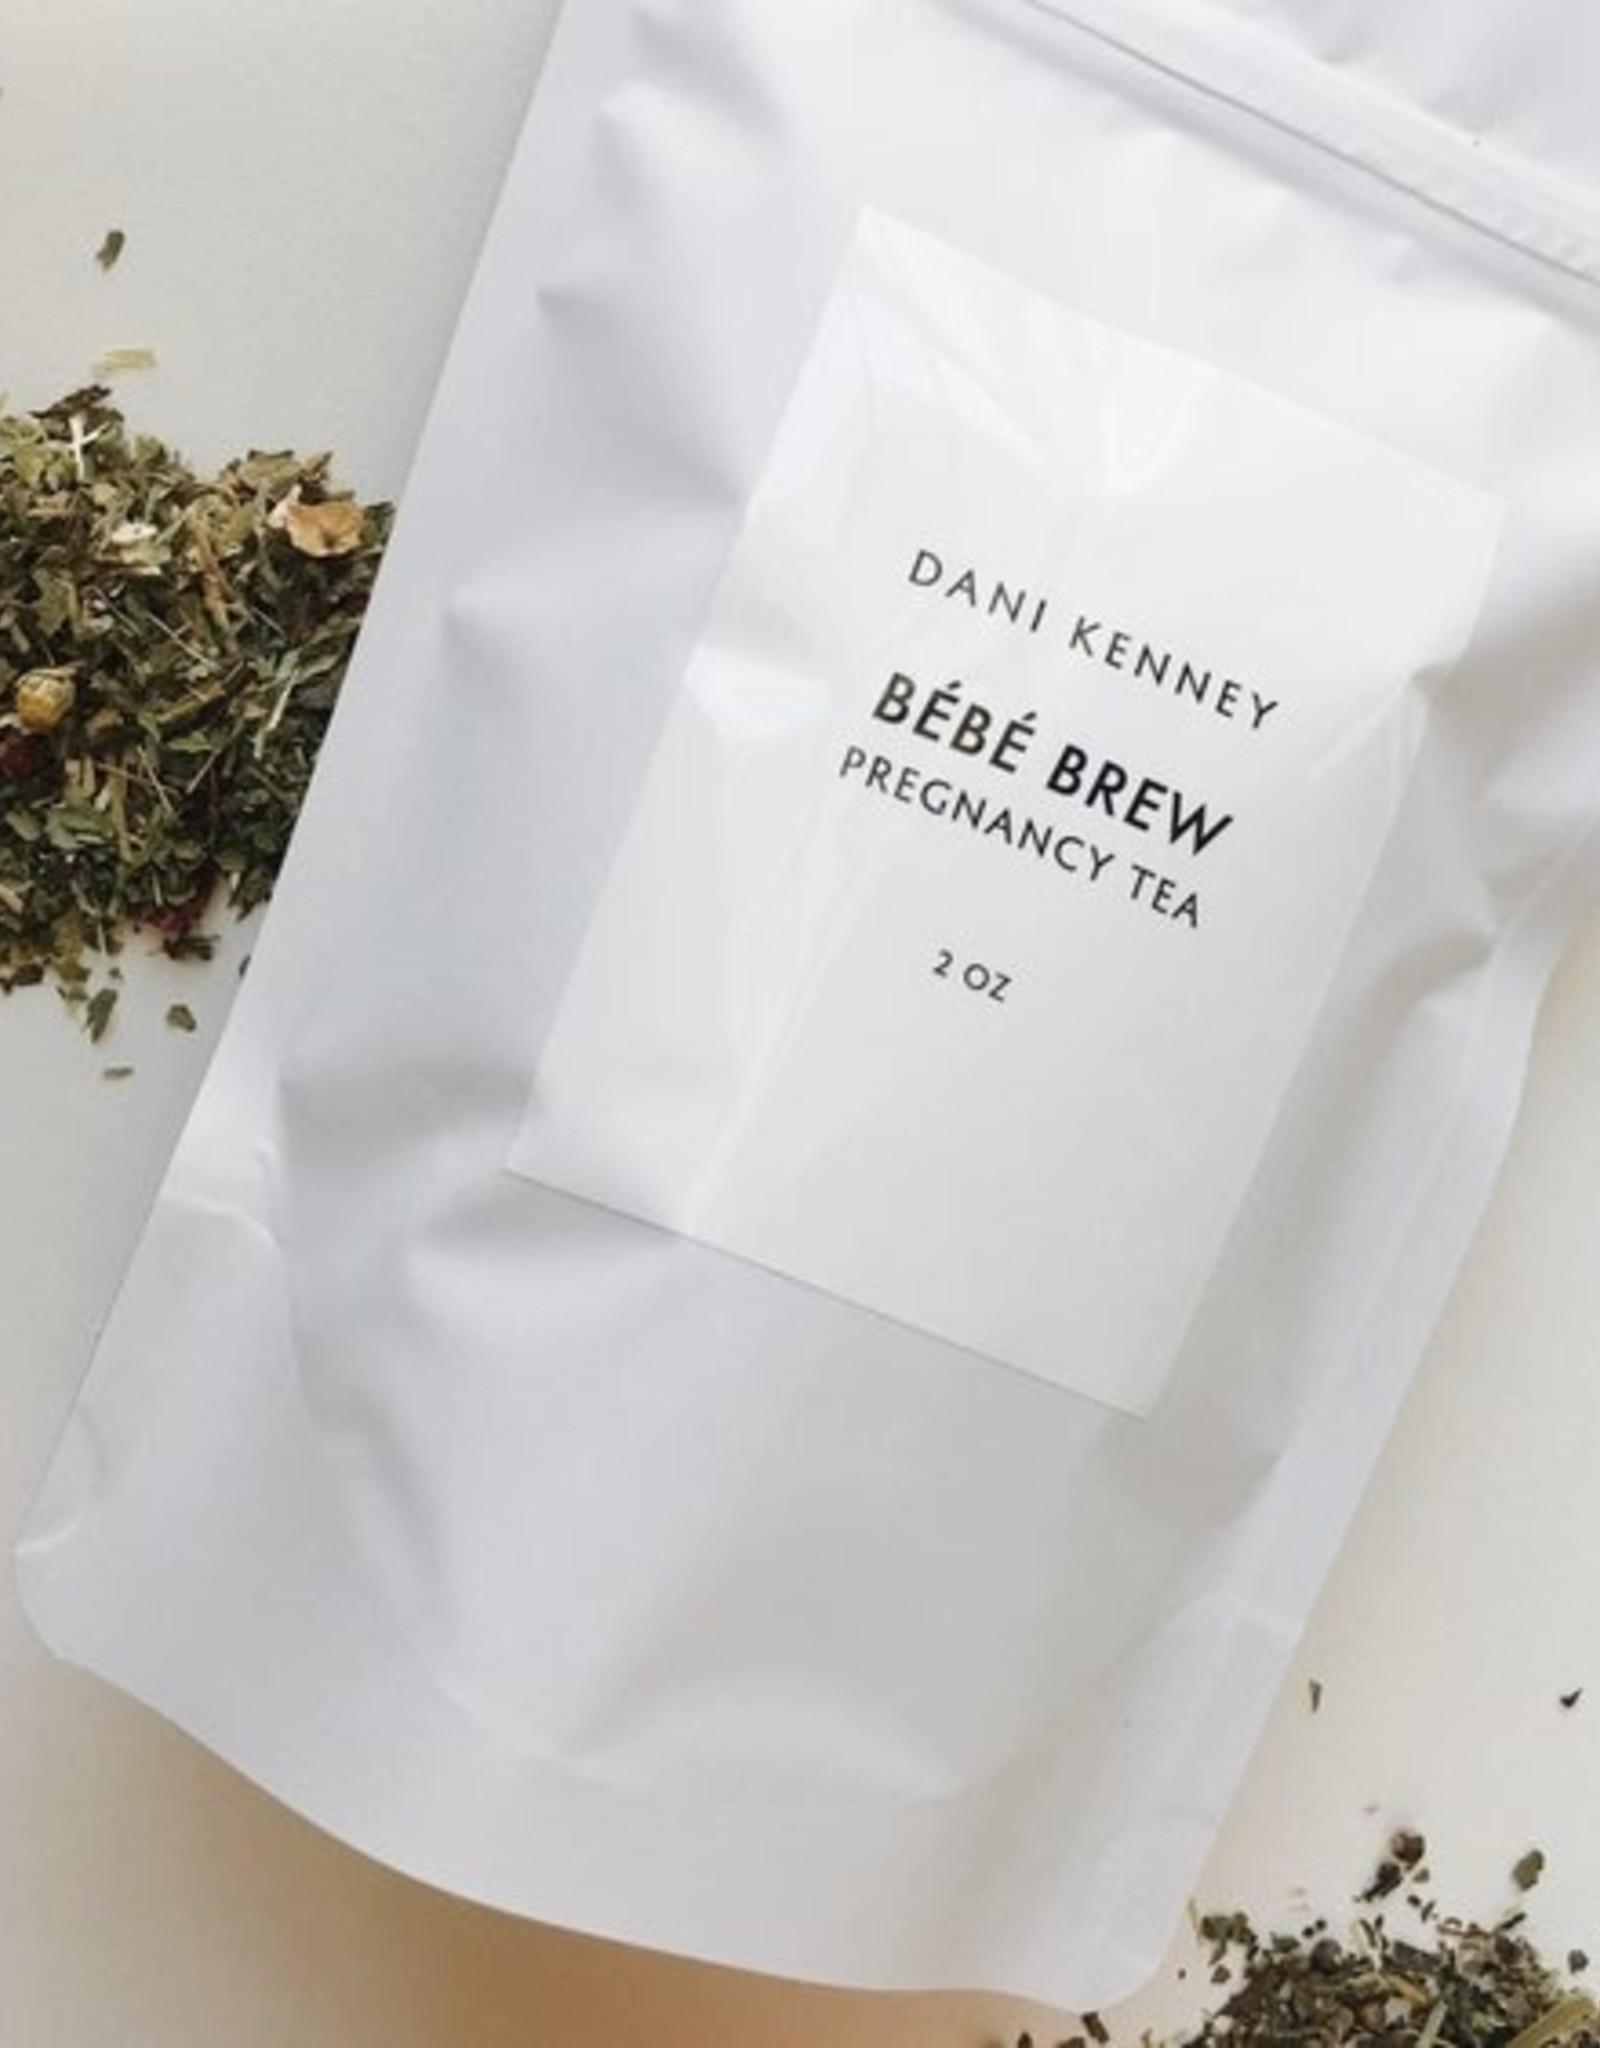 danikenney Pregnancy Tea: bebe Brew